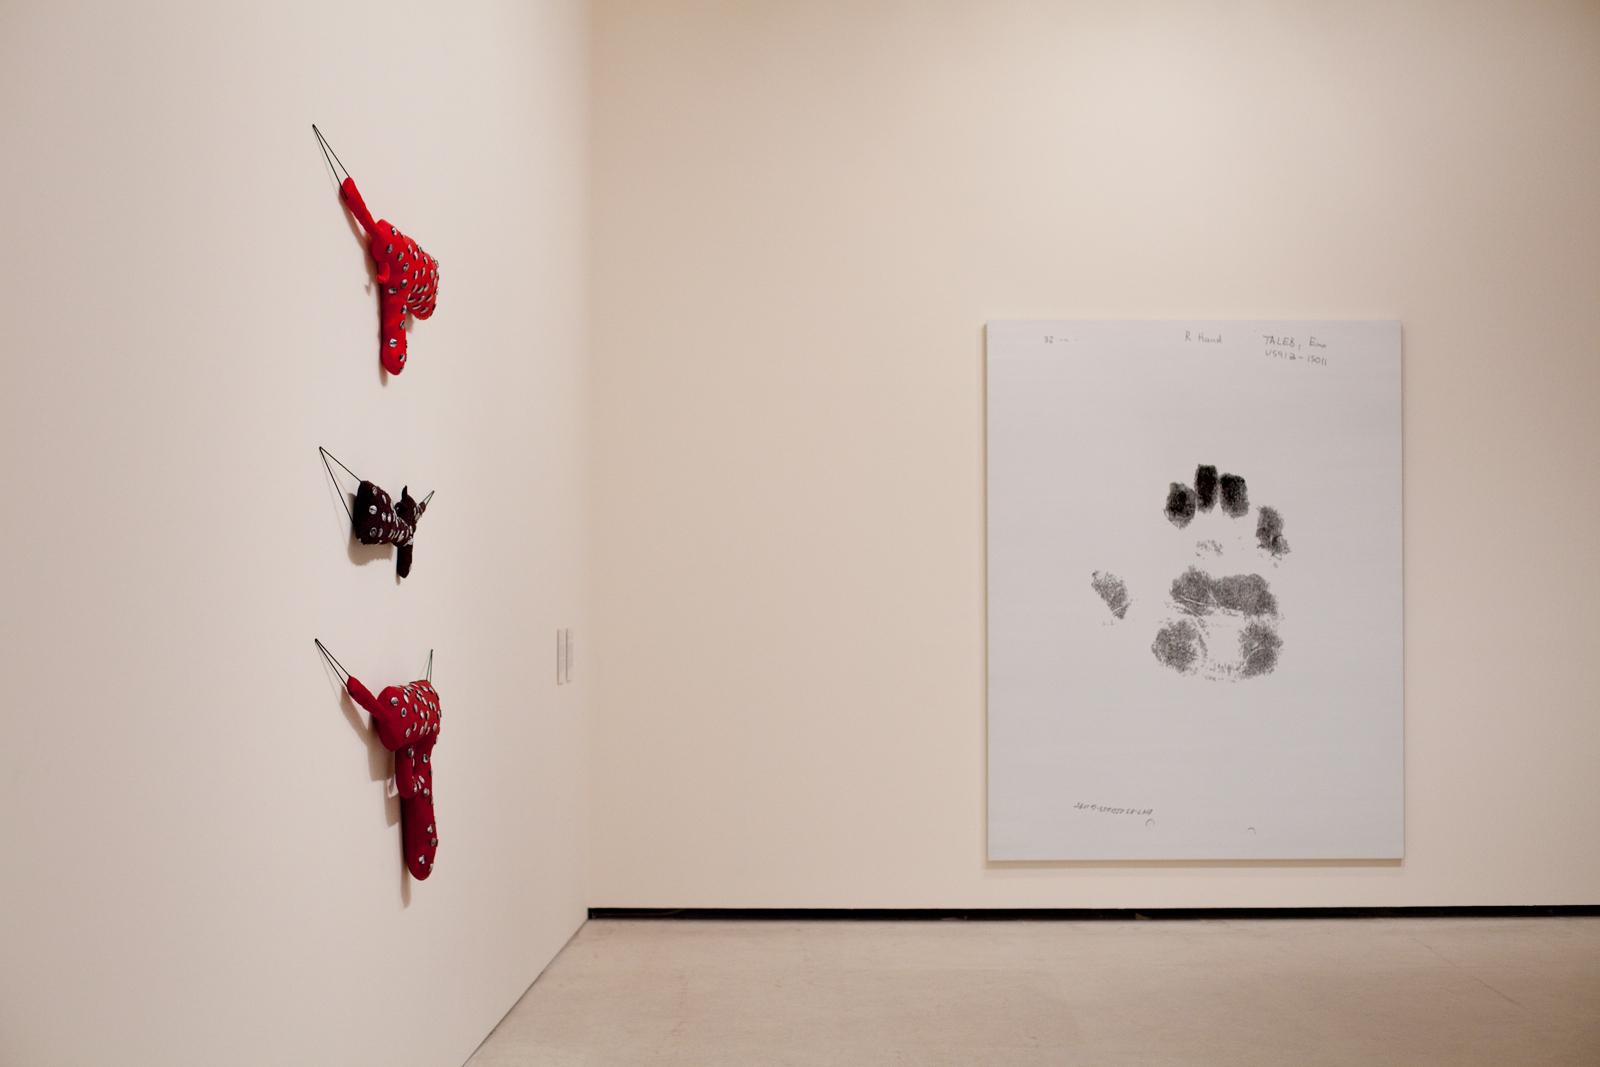 "Po lewej: Annette Messager ""Trois fusils"" (2007), poprawej: Jenny Holzer ""Right Hand 0147-03-CID259-61195 blue white"" (2007), Kolekcja Grażyny Kulczyk, fot.Bartek Buśko"